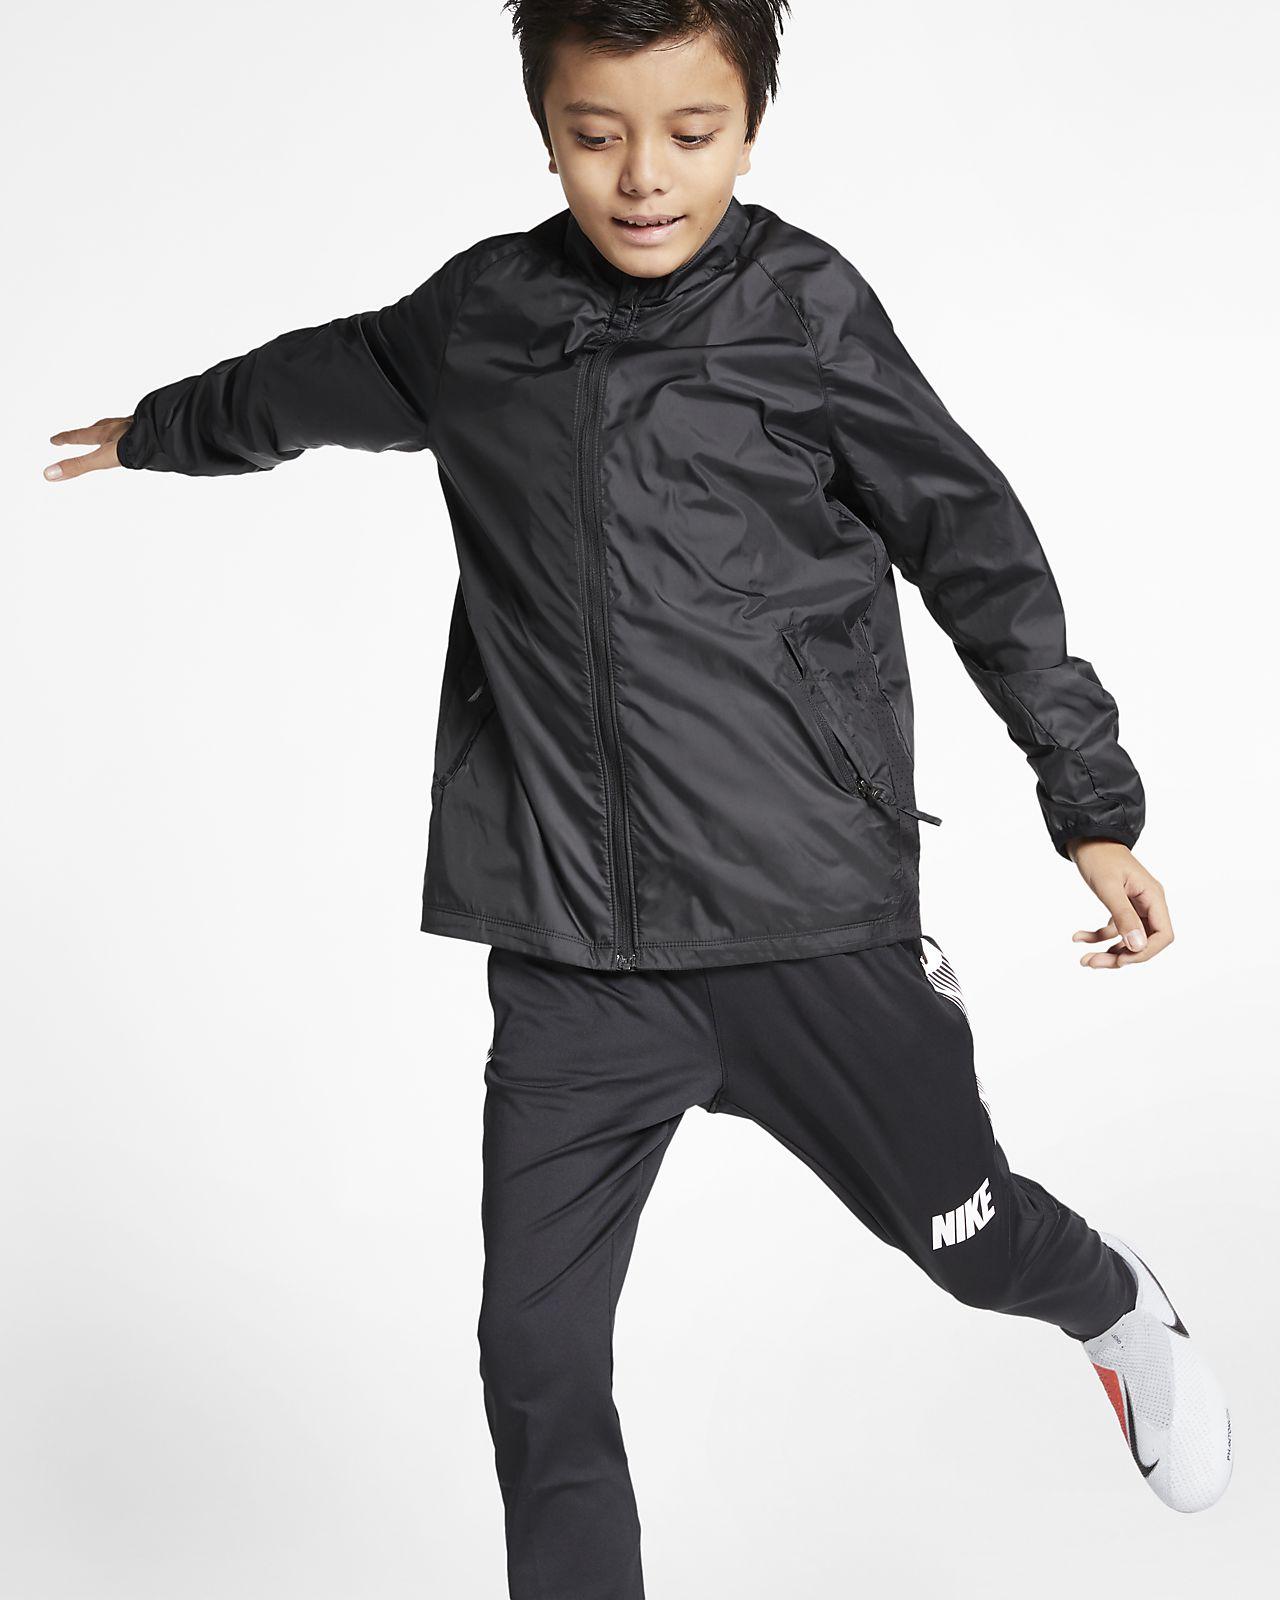 Football garçon NIKE Veste junior Nike Academy